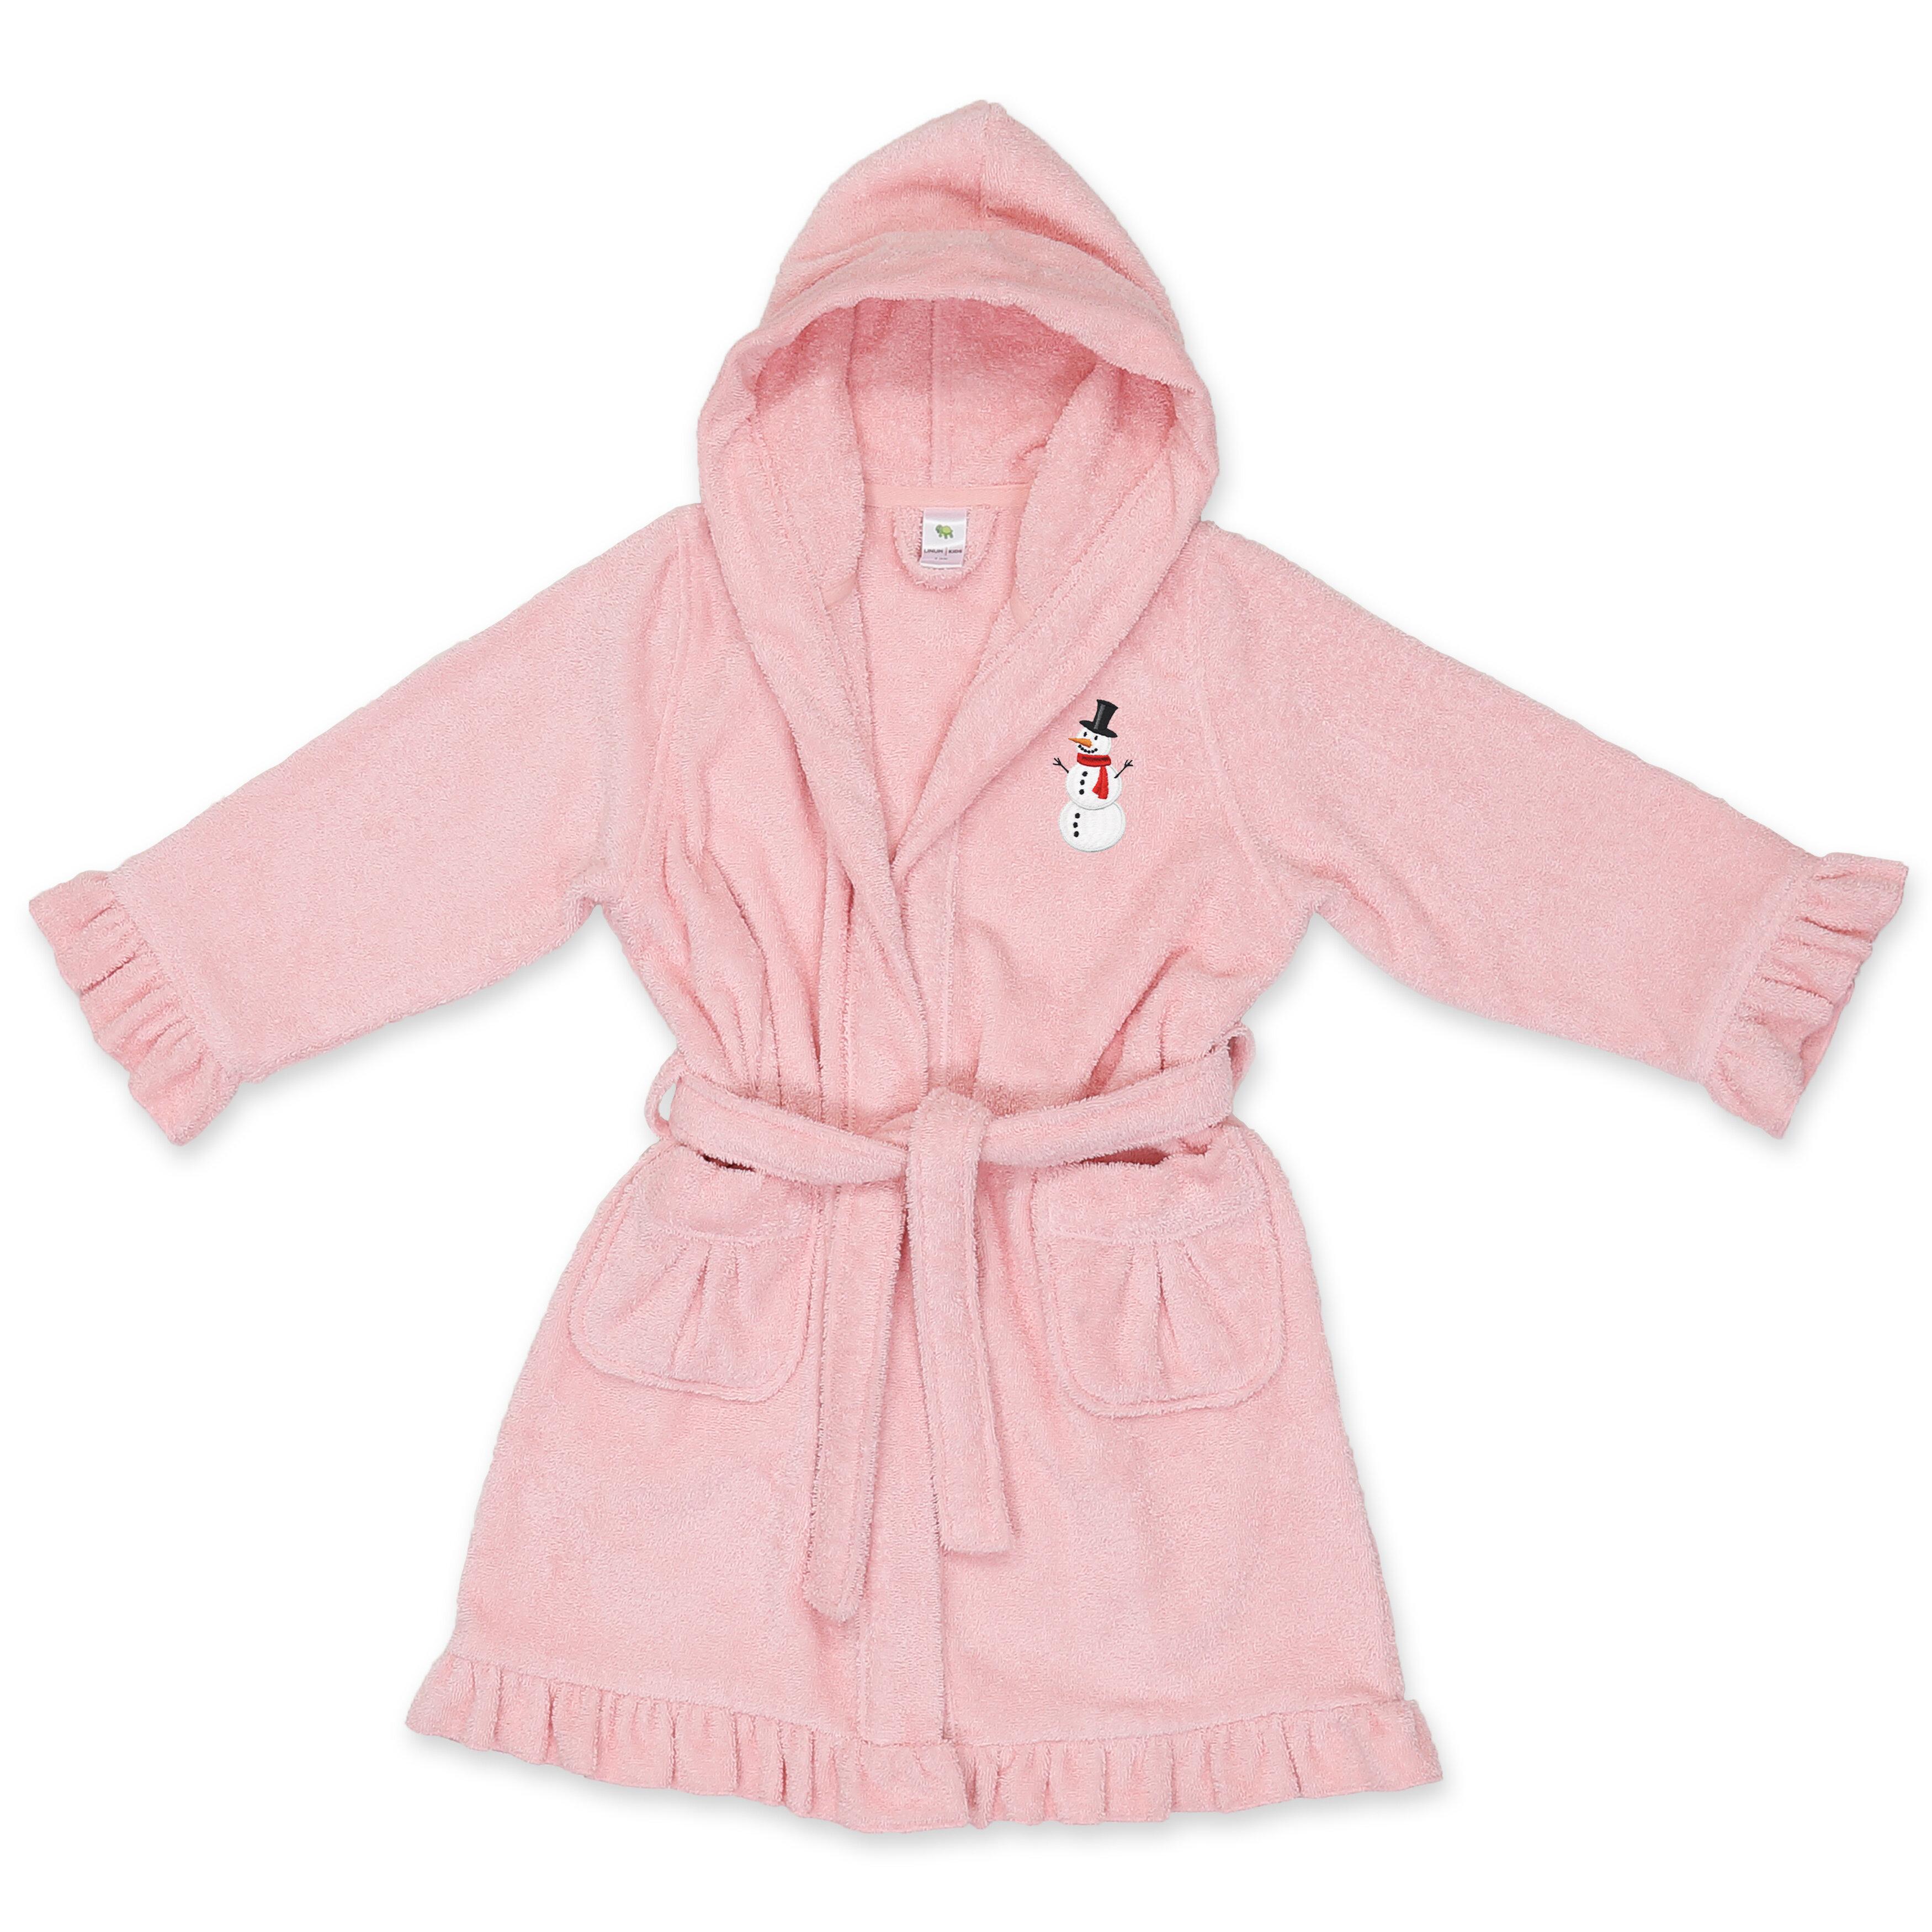 7fe3b5403c Harriet Bee Astin Snowman Design Kids 100% Turkish Cotton Terry Cloth  Bathrobe